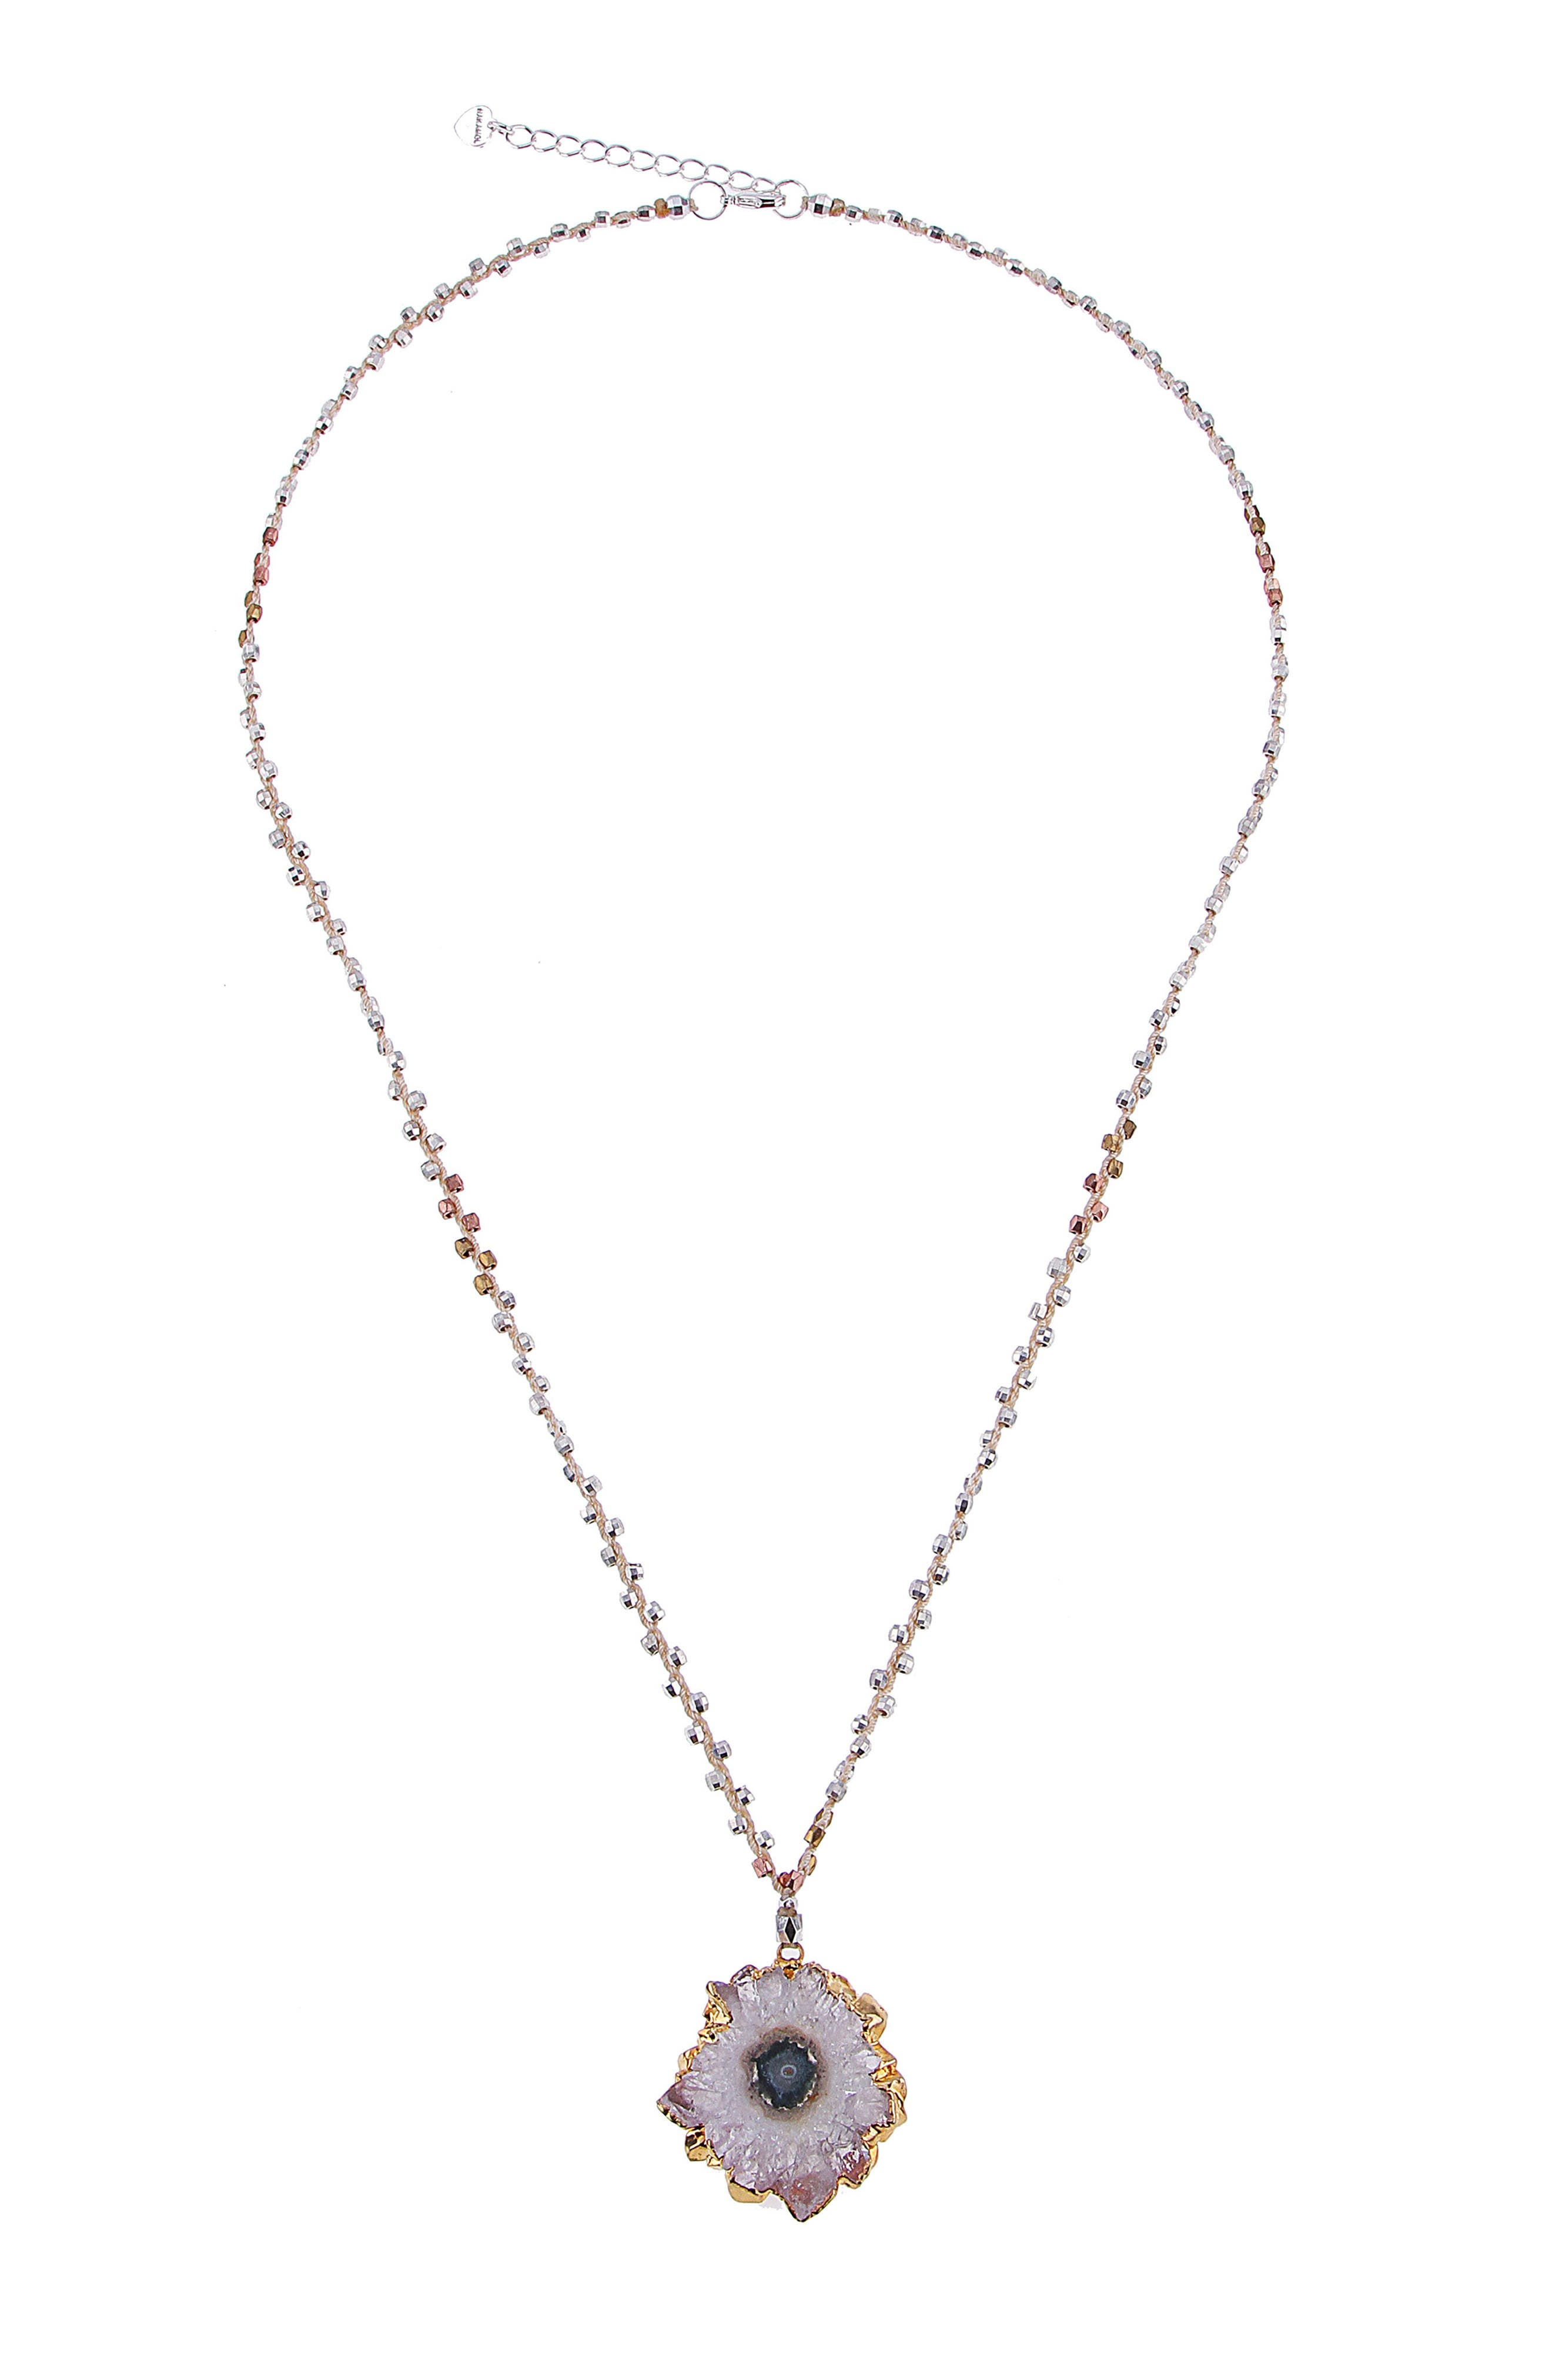 Cote Amethyst Pendant Necklace,                             Main thumbnail 1, color,                             Clear